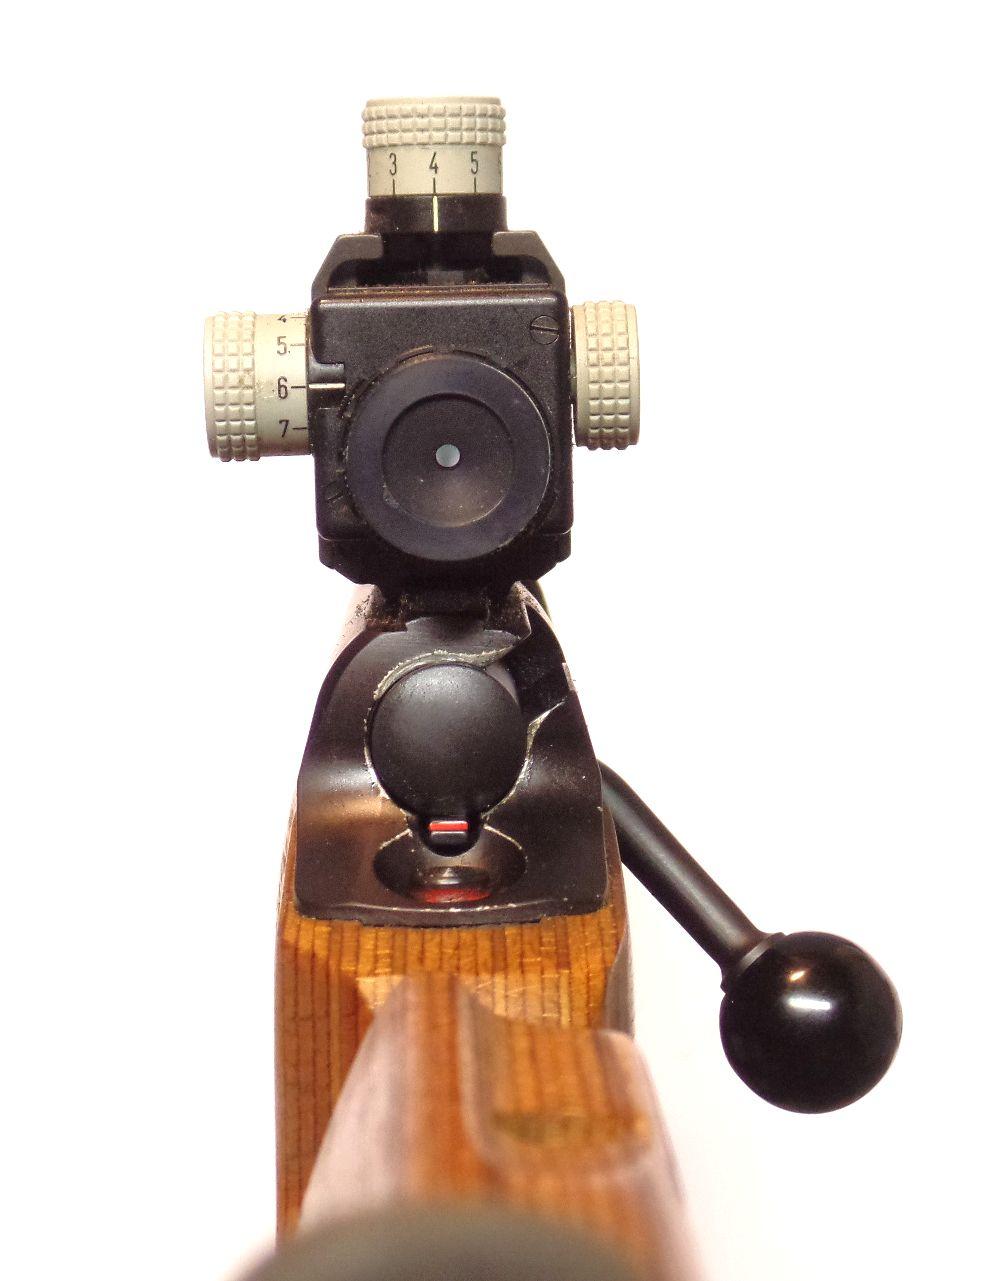 SIG SAUER 205 calibre 7.5x55